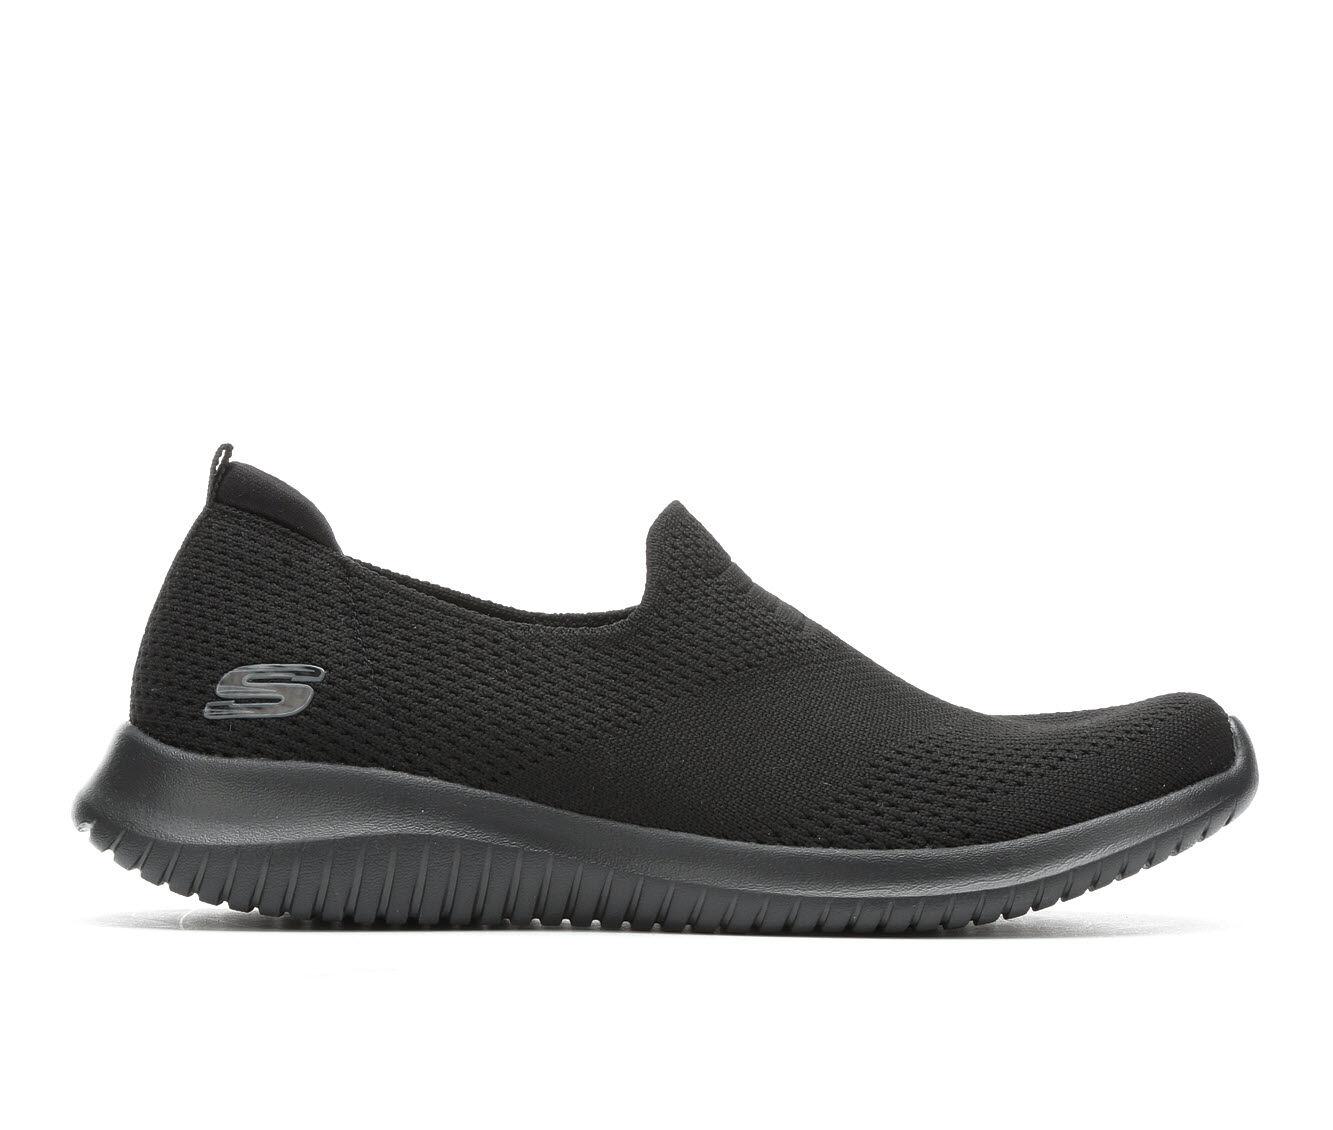 Skechers Harmonious 13106 Sneakers